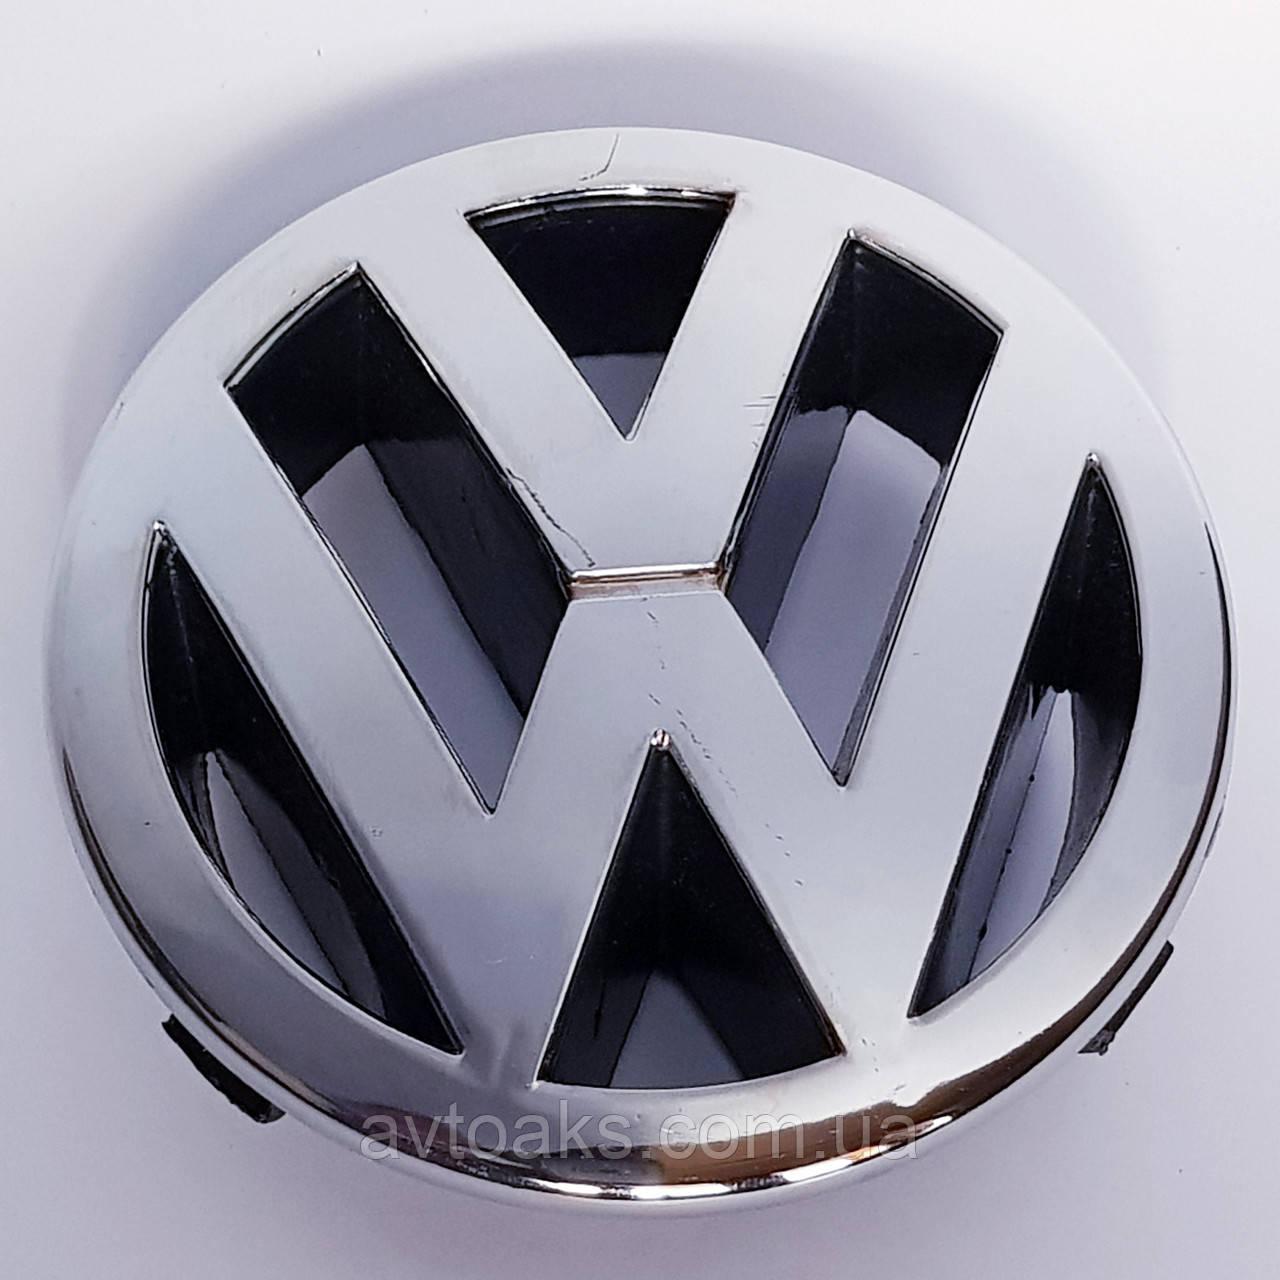 Эмблема Volkswagen Passat B5 перед (рестайлинг)